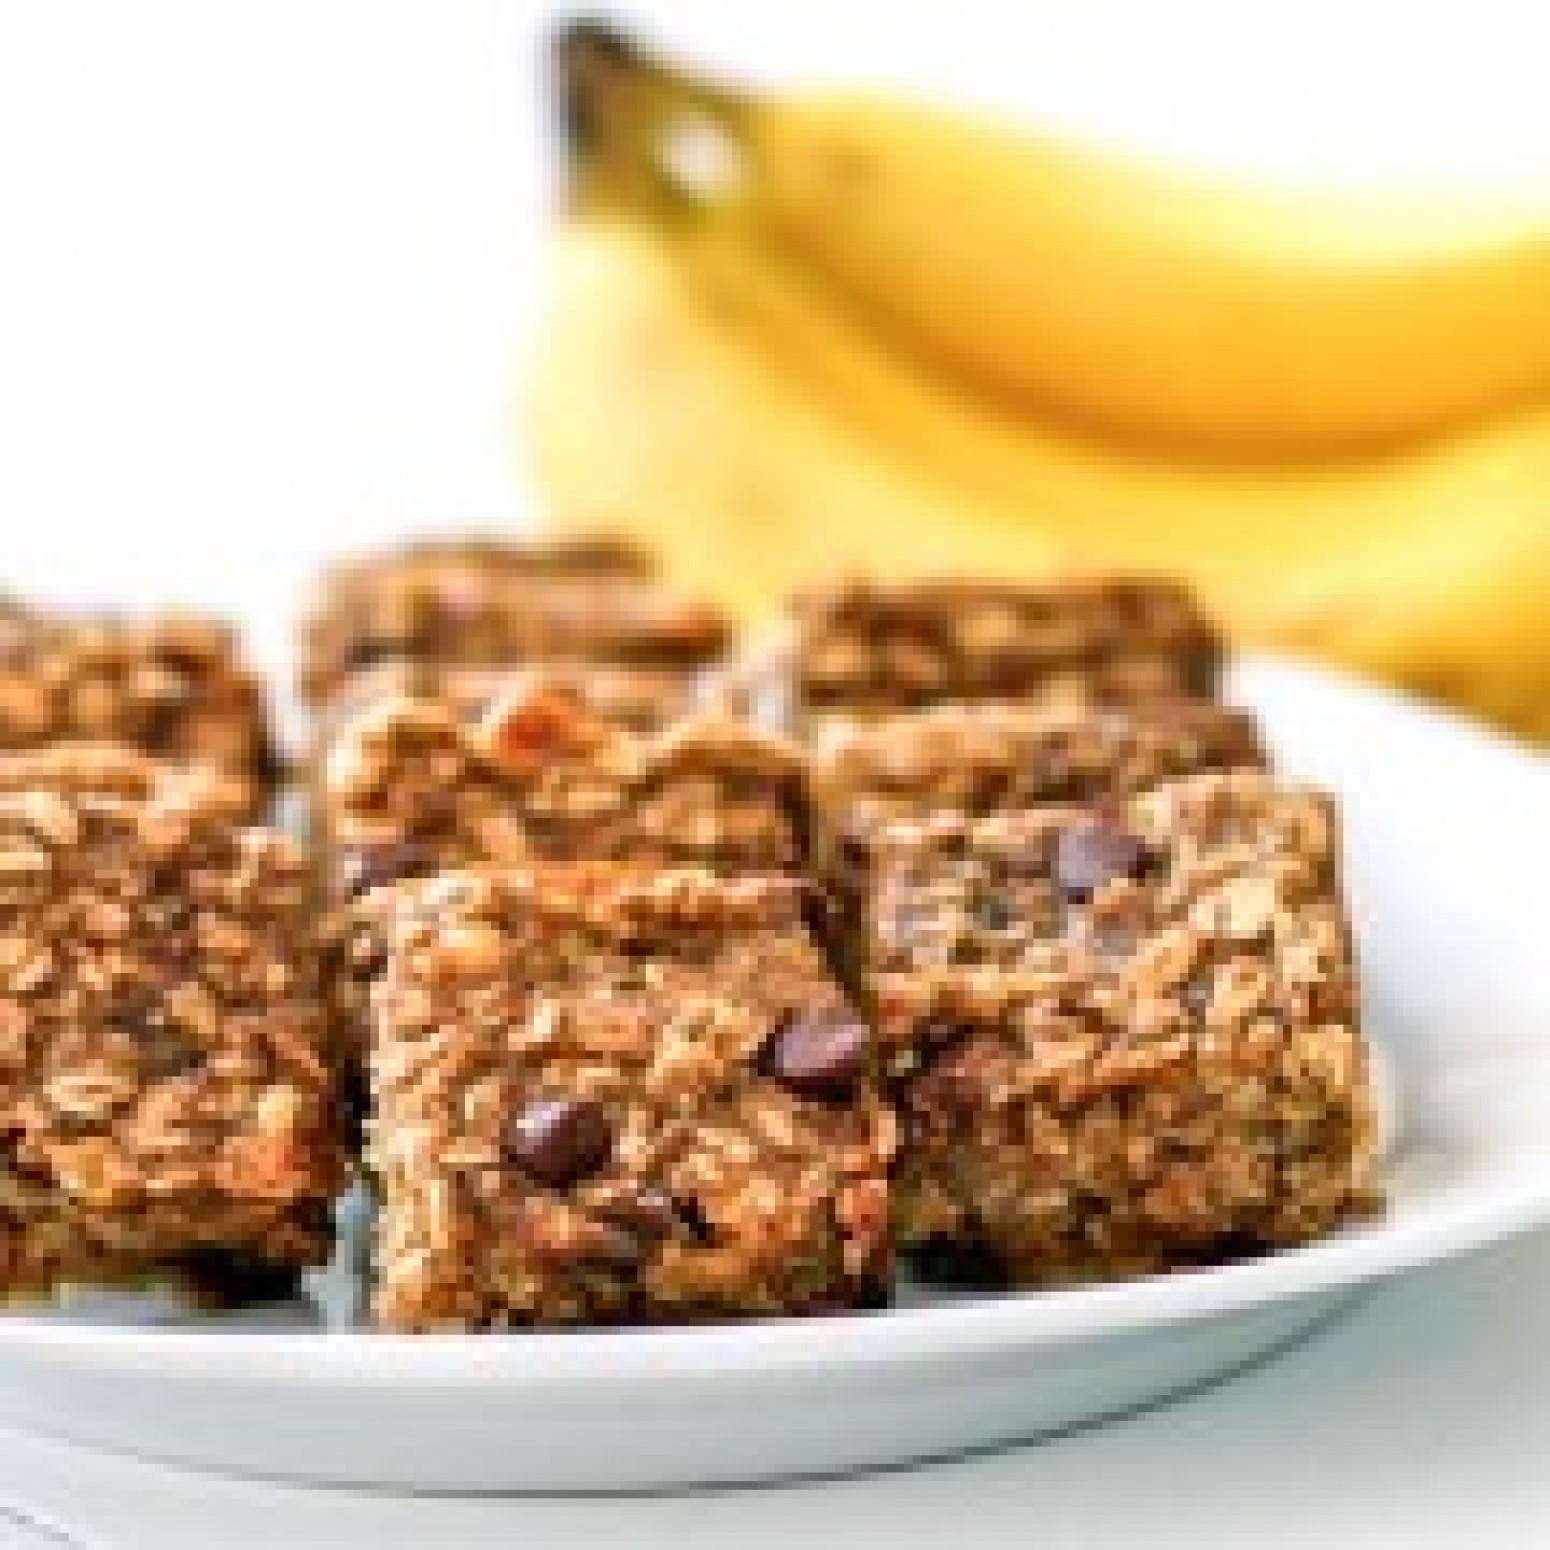 Peanut Butter Banana Chocolate Chip Oatmeal Bars Recipe | Just A Pinch ...